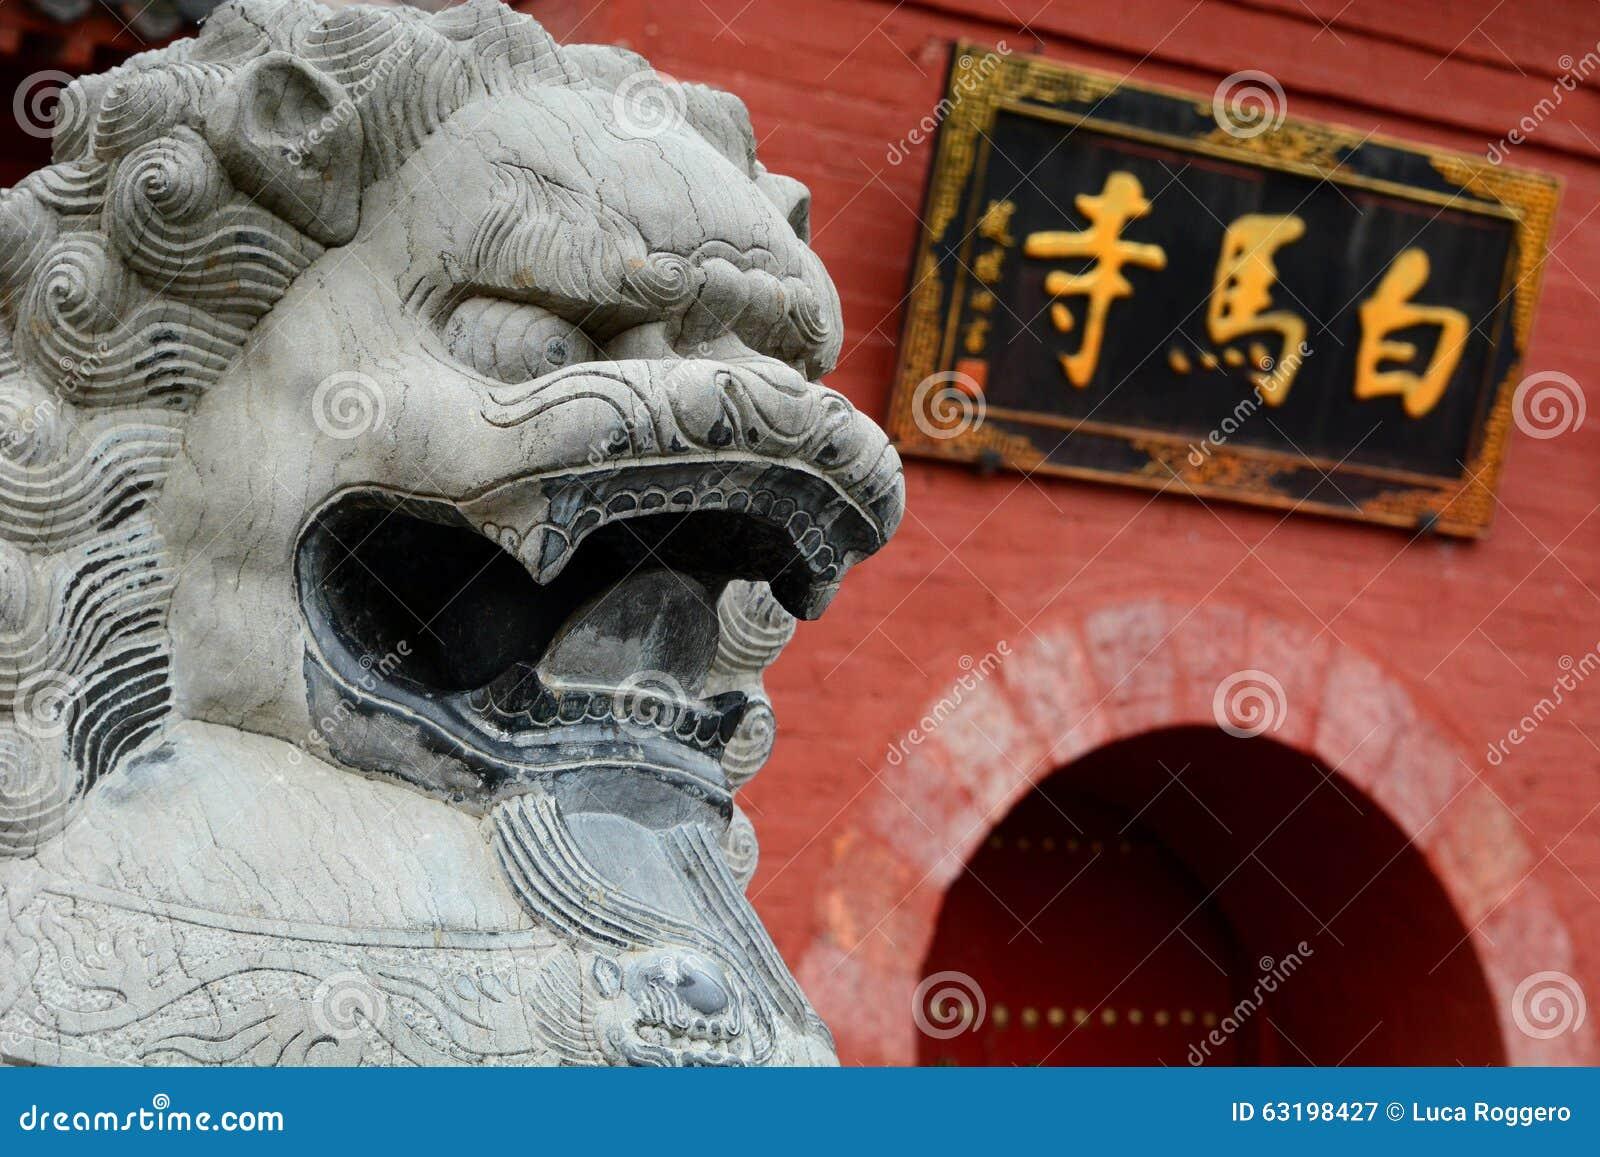 Entrance gate detail. White Horse Temple. Luoyang, Henan. China